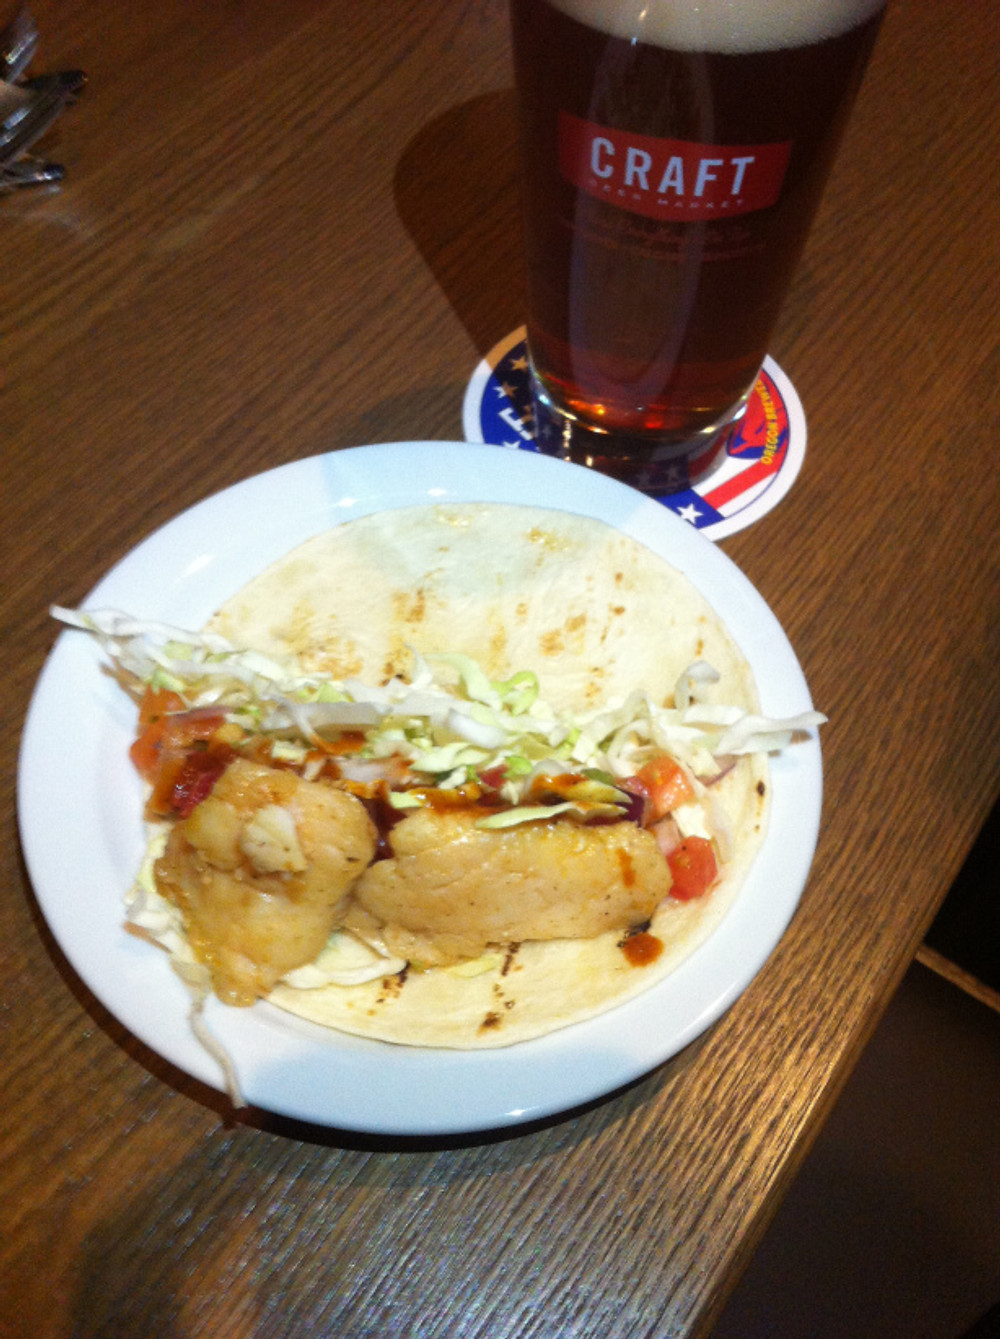 Craft Beer Market Fish Tacos